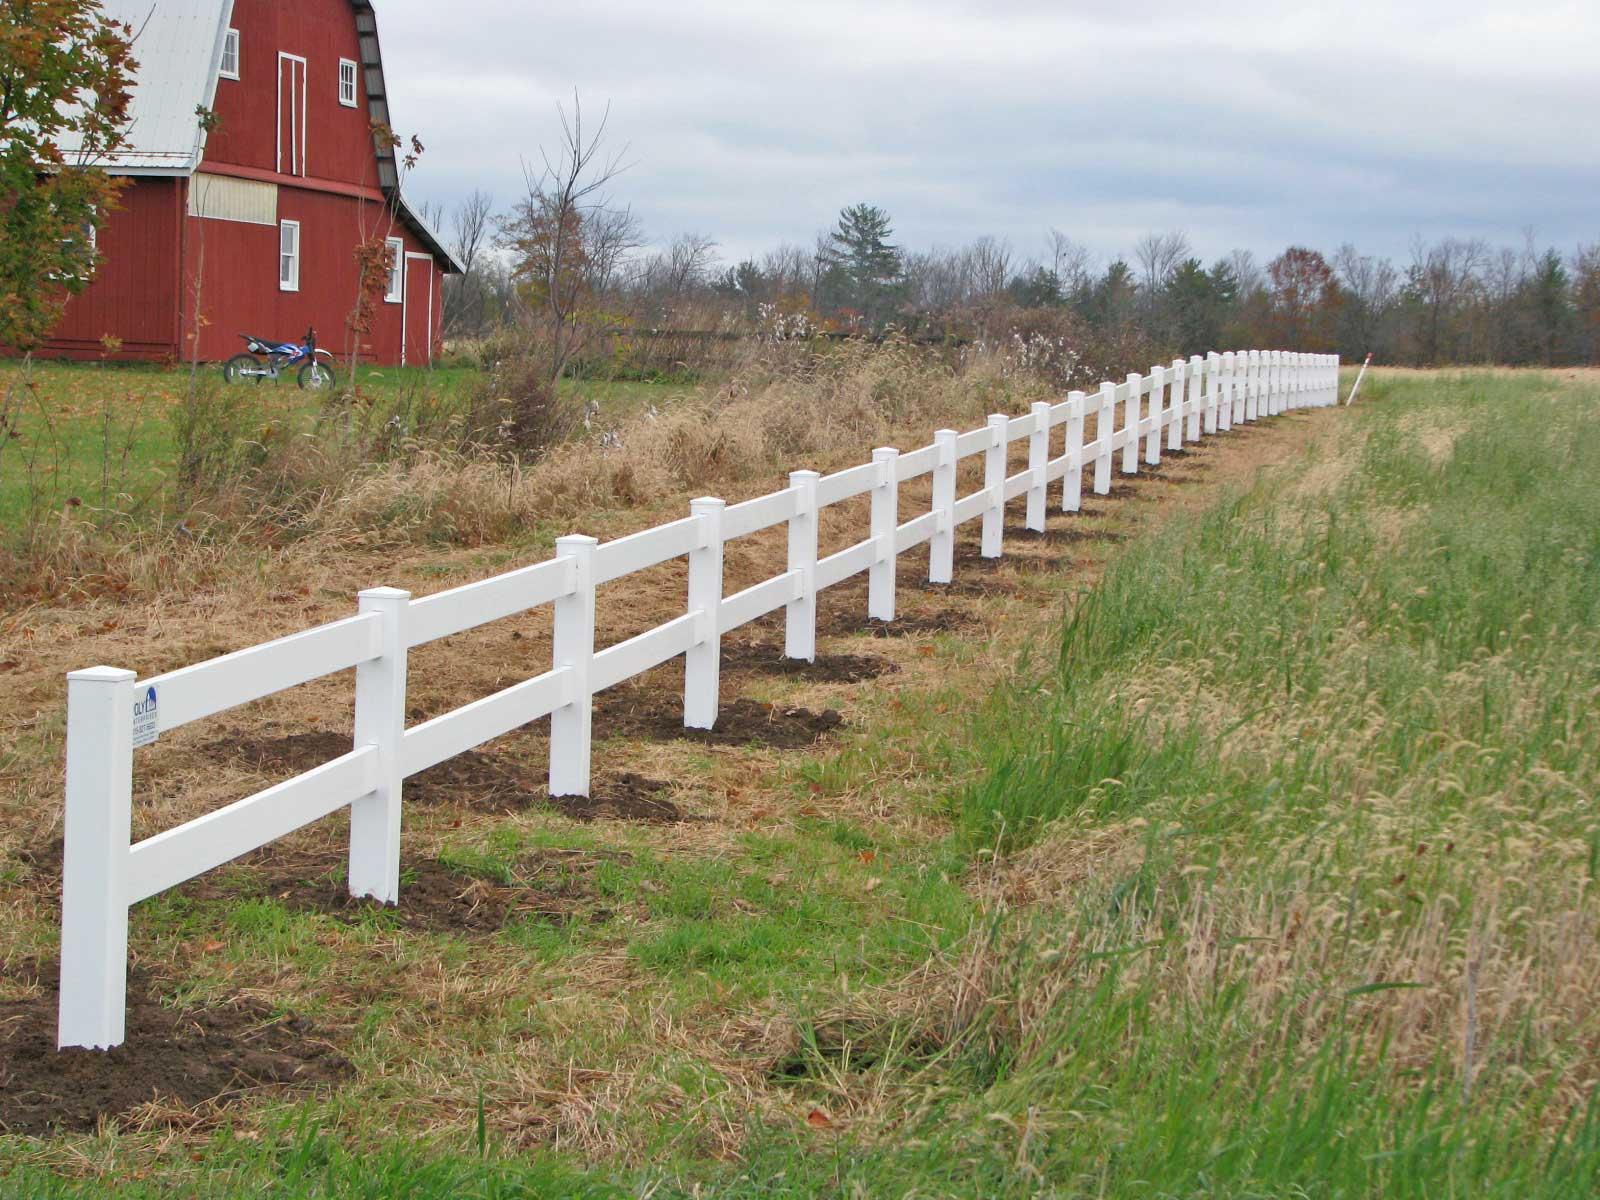 2 Rail Wood Horse Fence Ideas Site